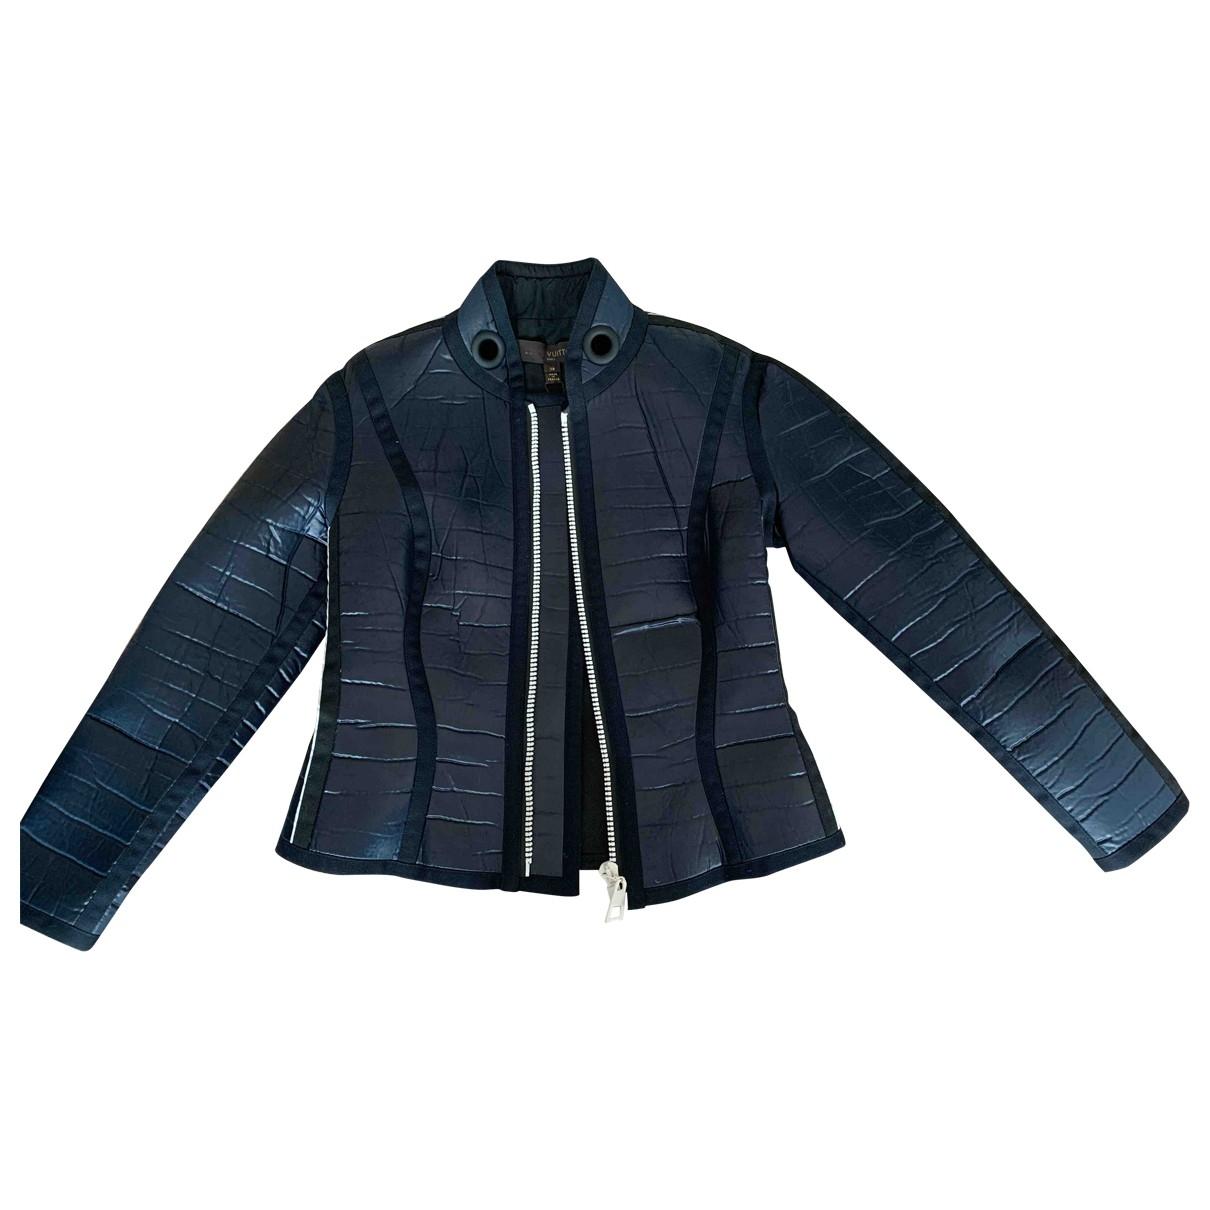 Louis Vuitton \N Navy coat for Women 38 FR